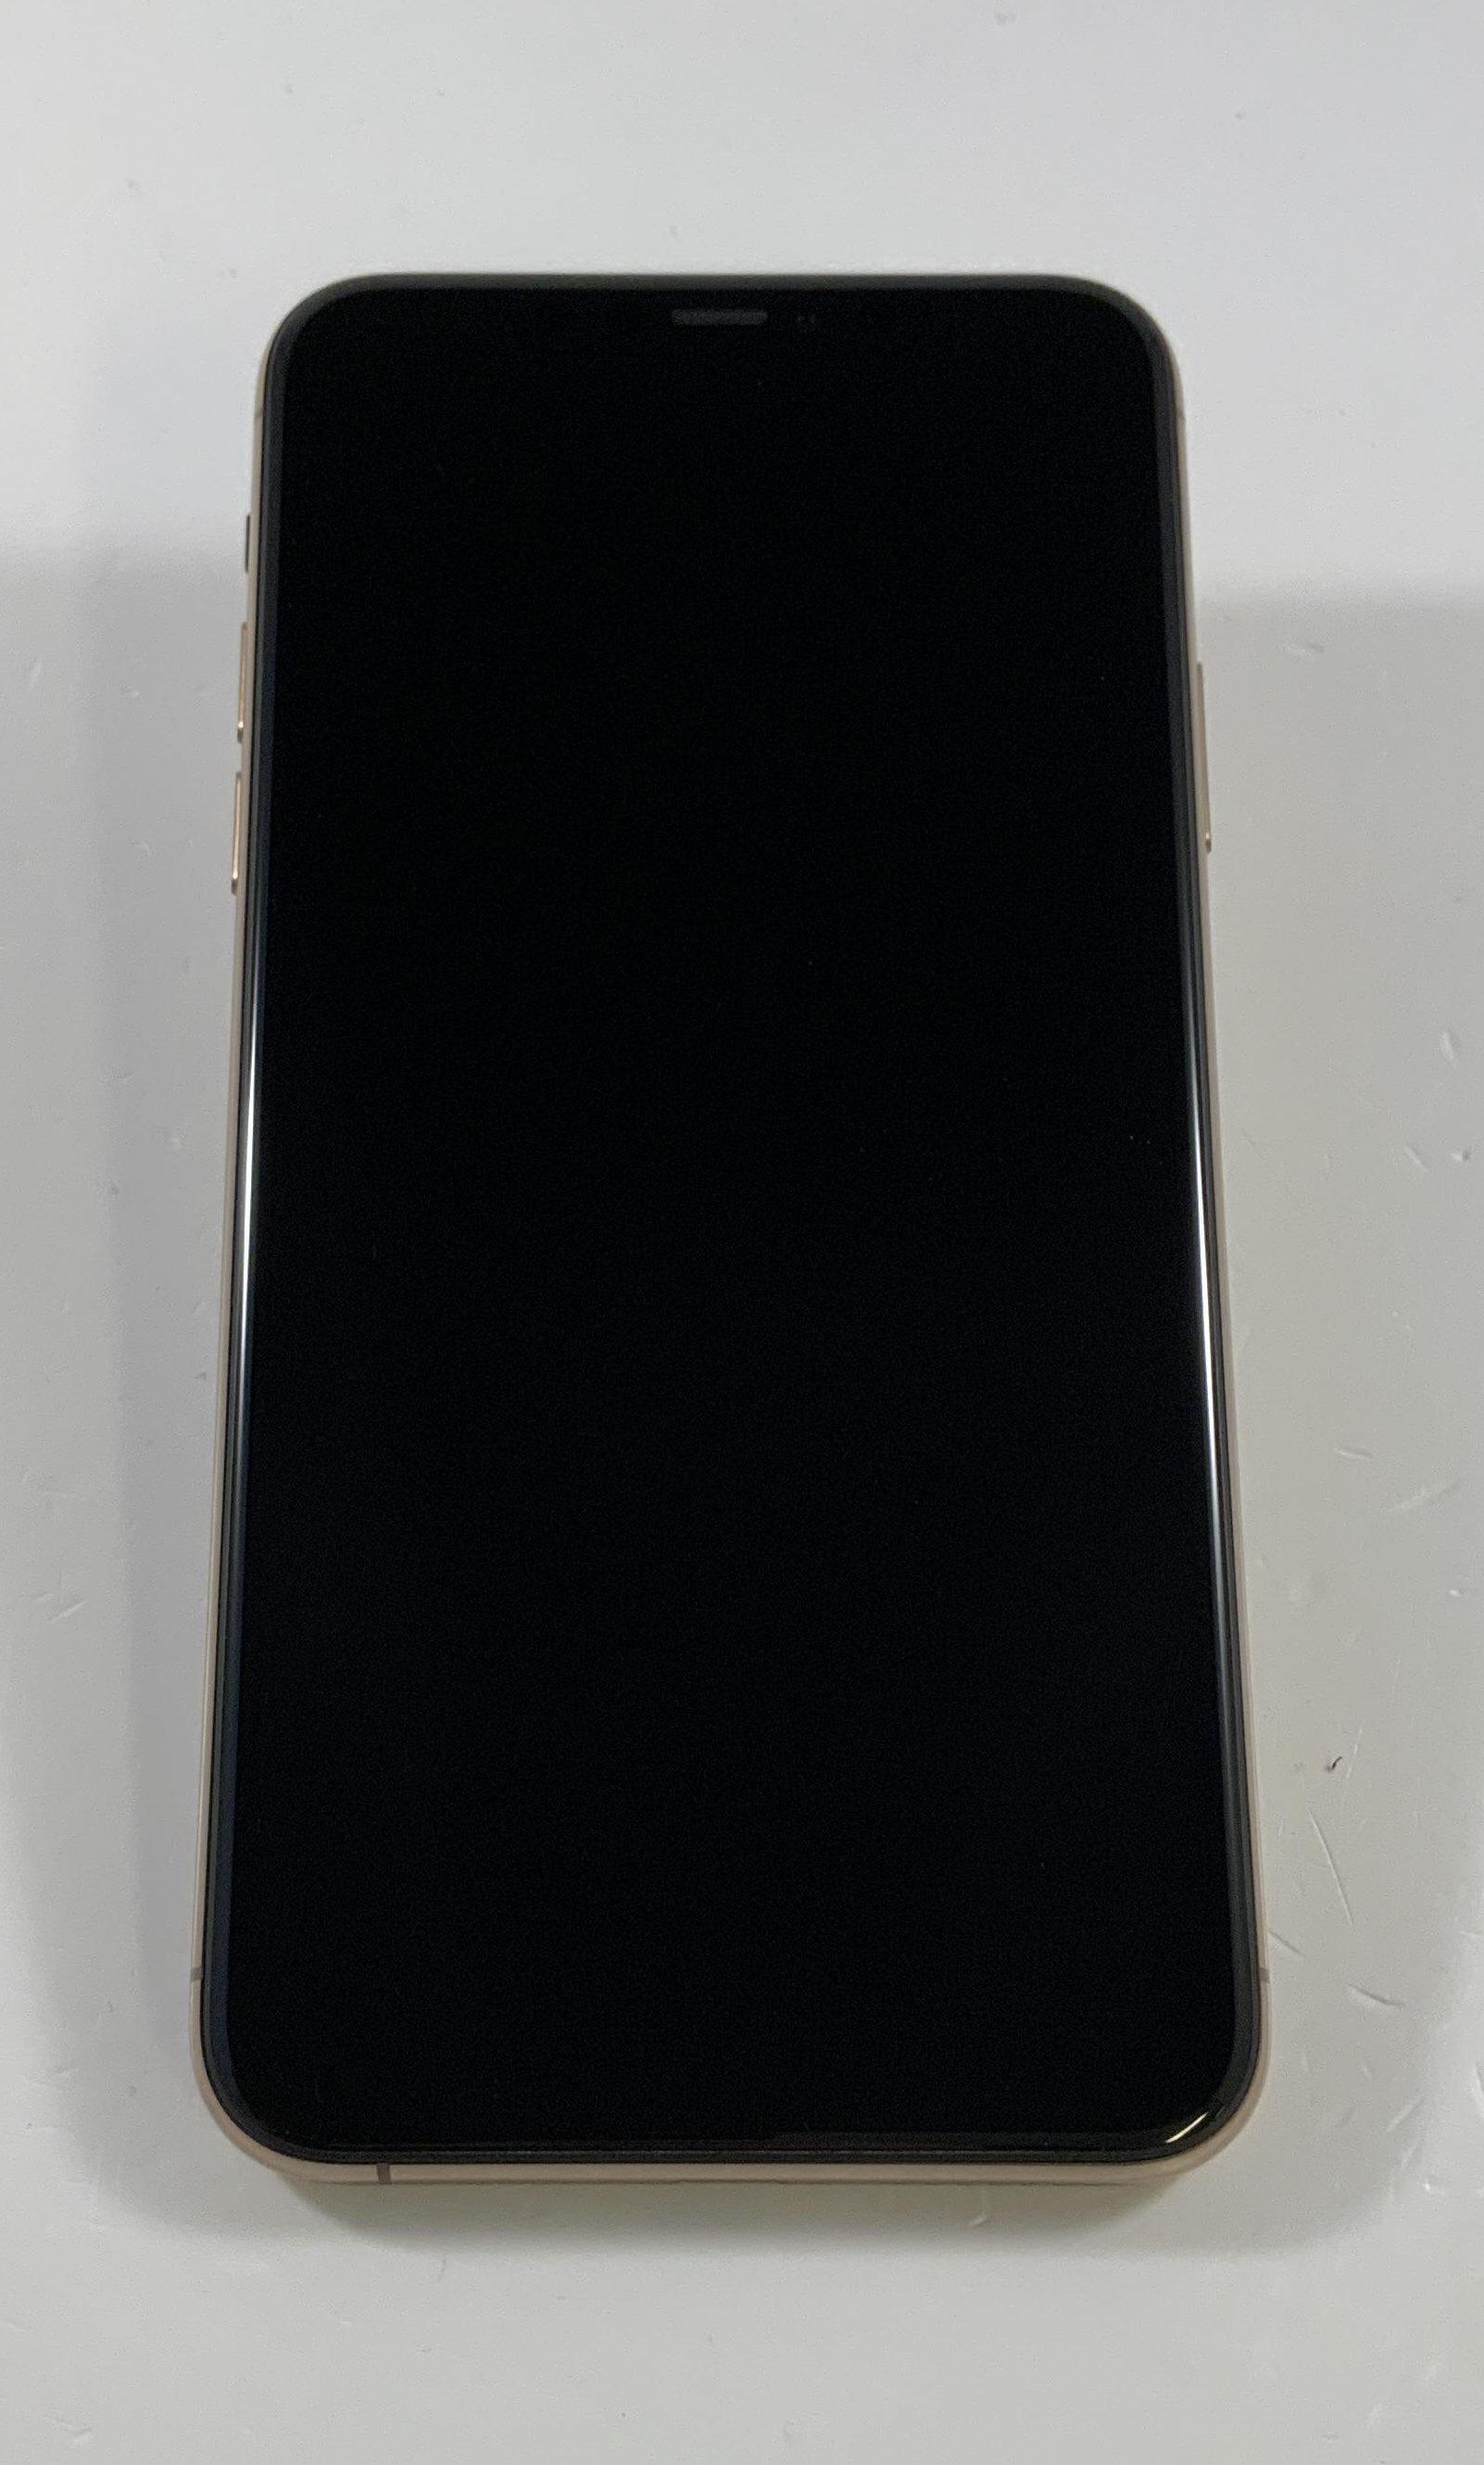 iPhone 11 Pro Max 256GB, 256GB, Gold, Afbeelding 1